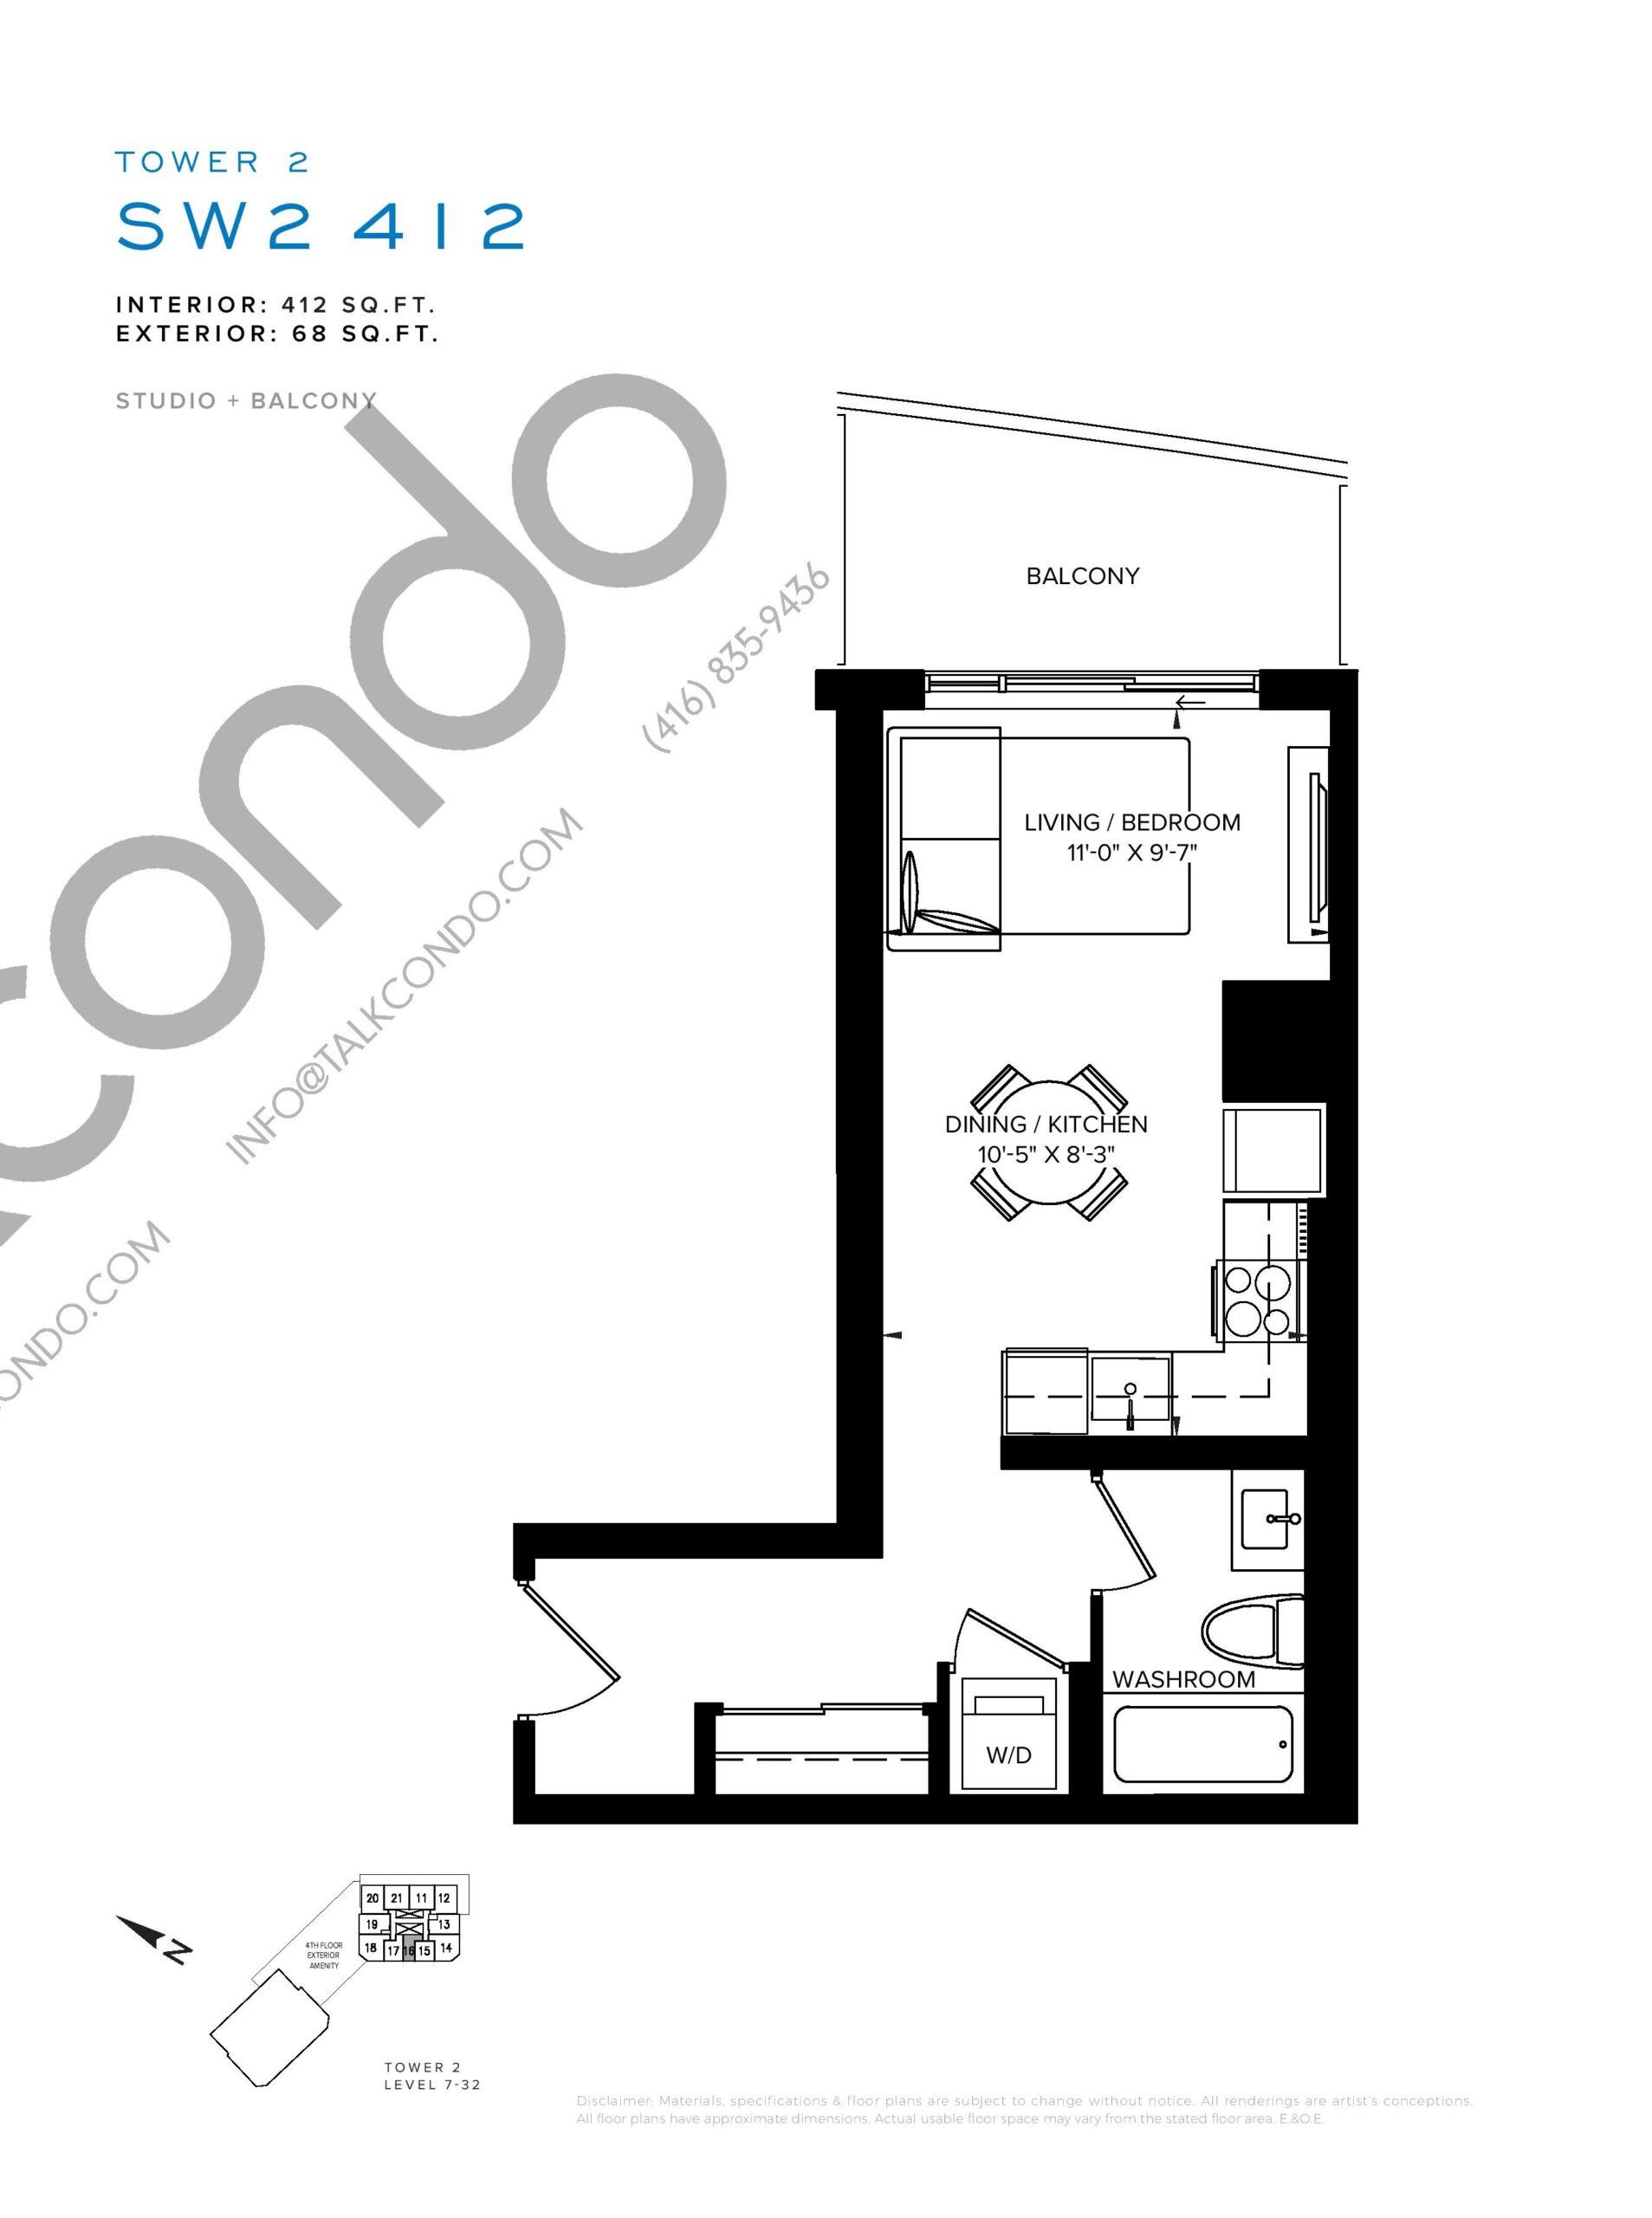 SW2 412 Floor Plan at SXSW Tower 2 Condos (SXSW2) - 412 sq.ft